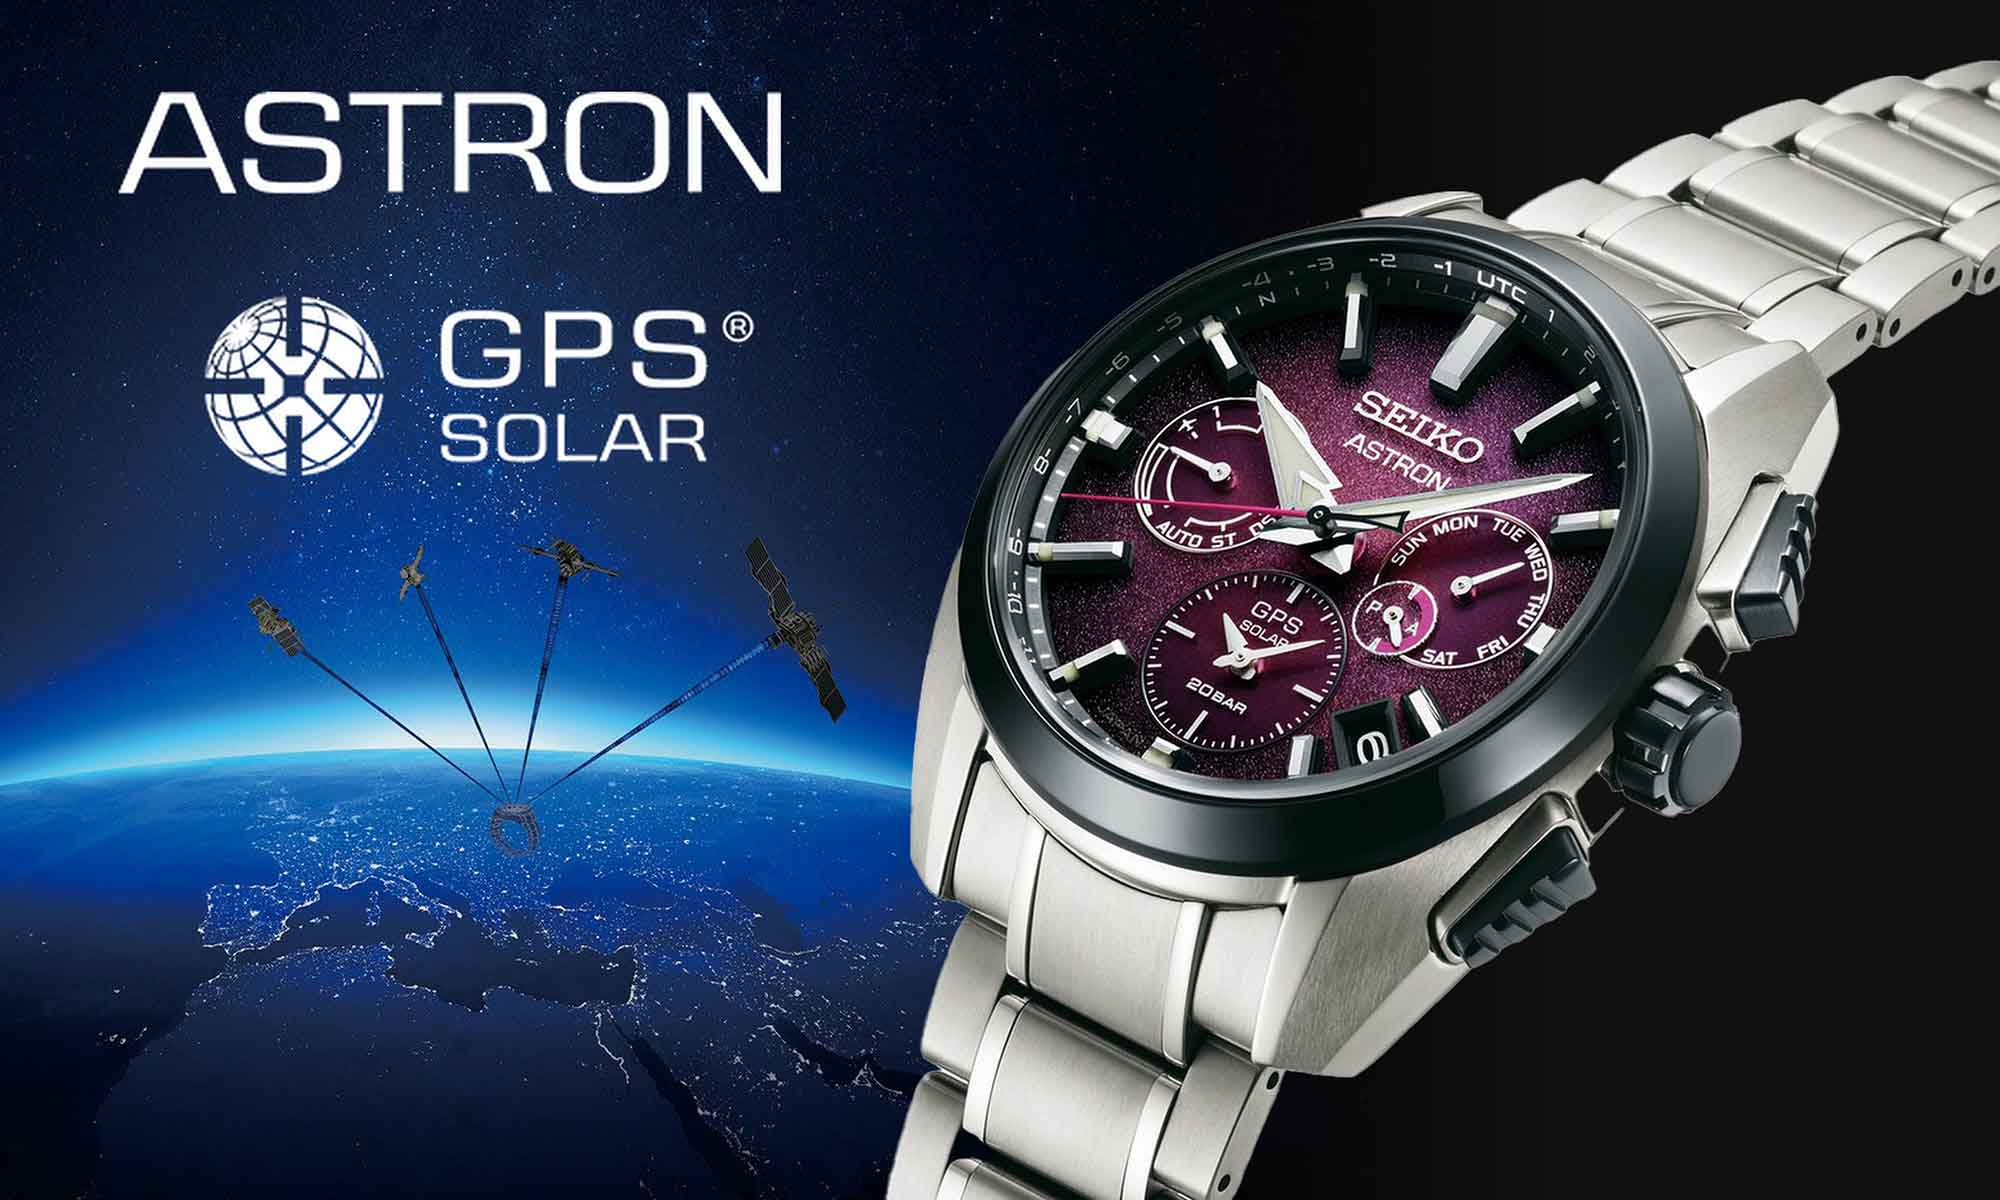 Seiko Astron 101-105 limited edition